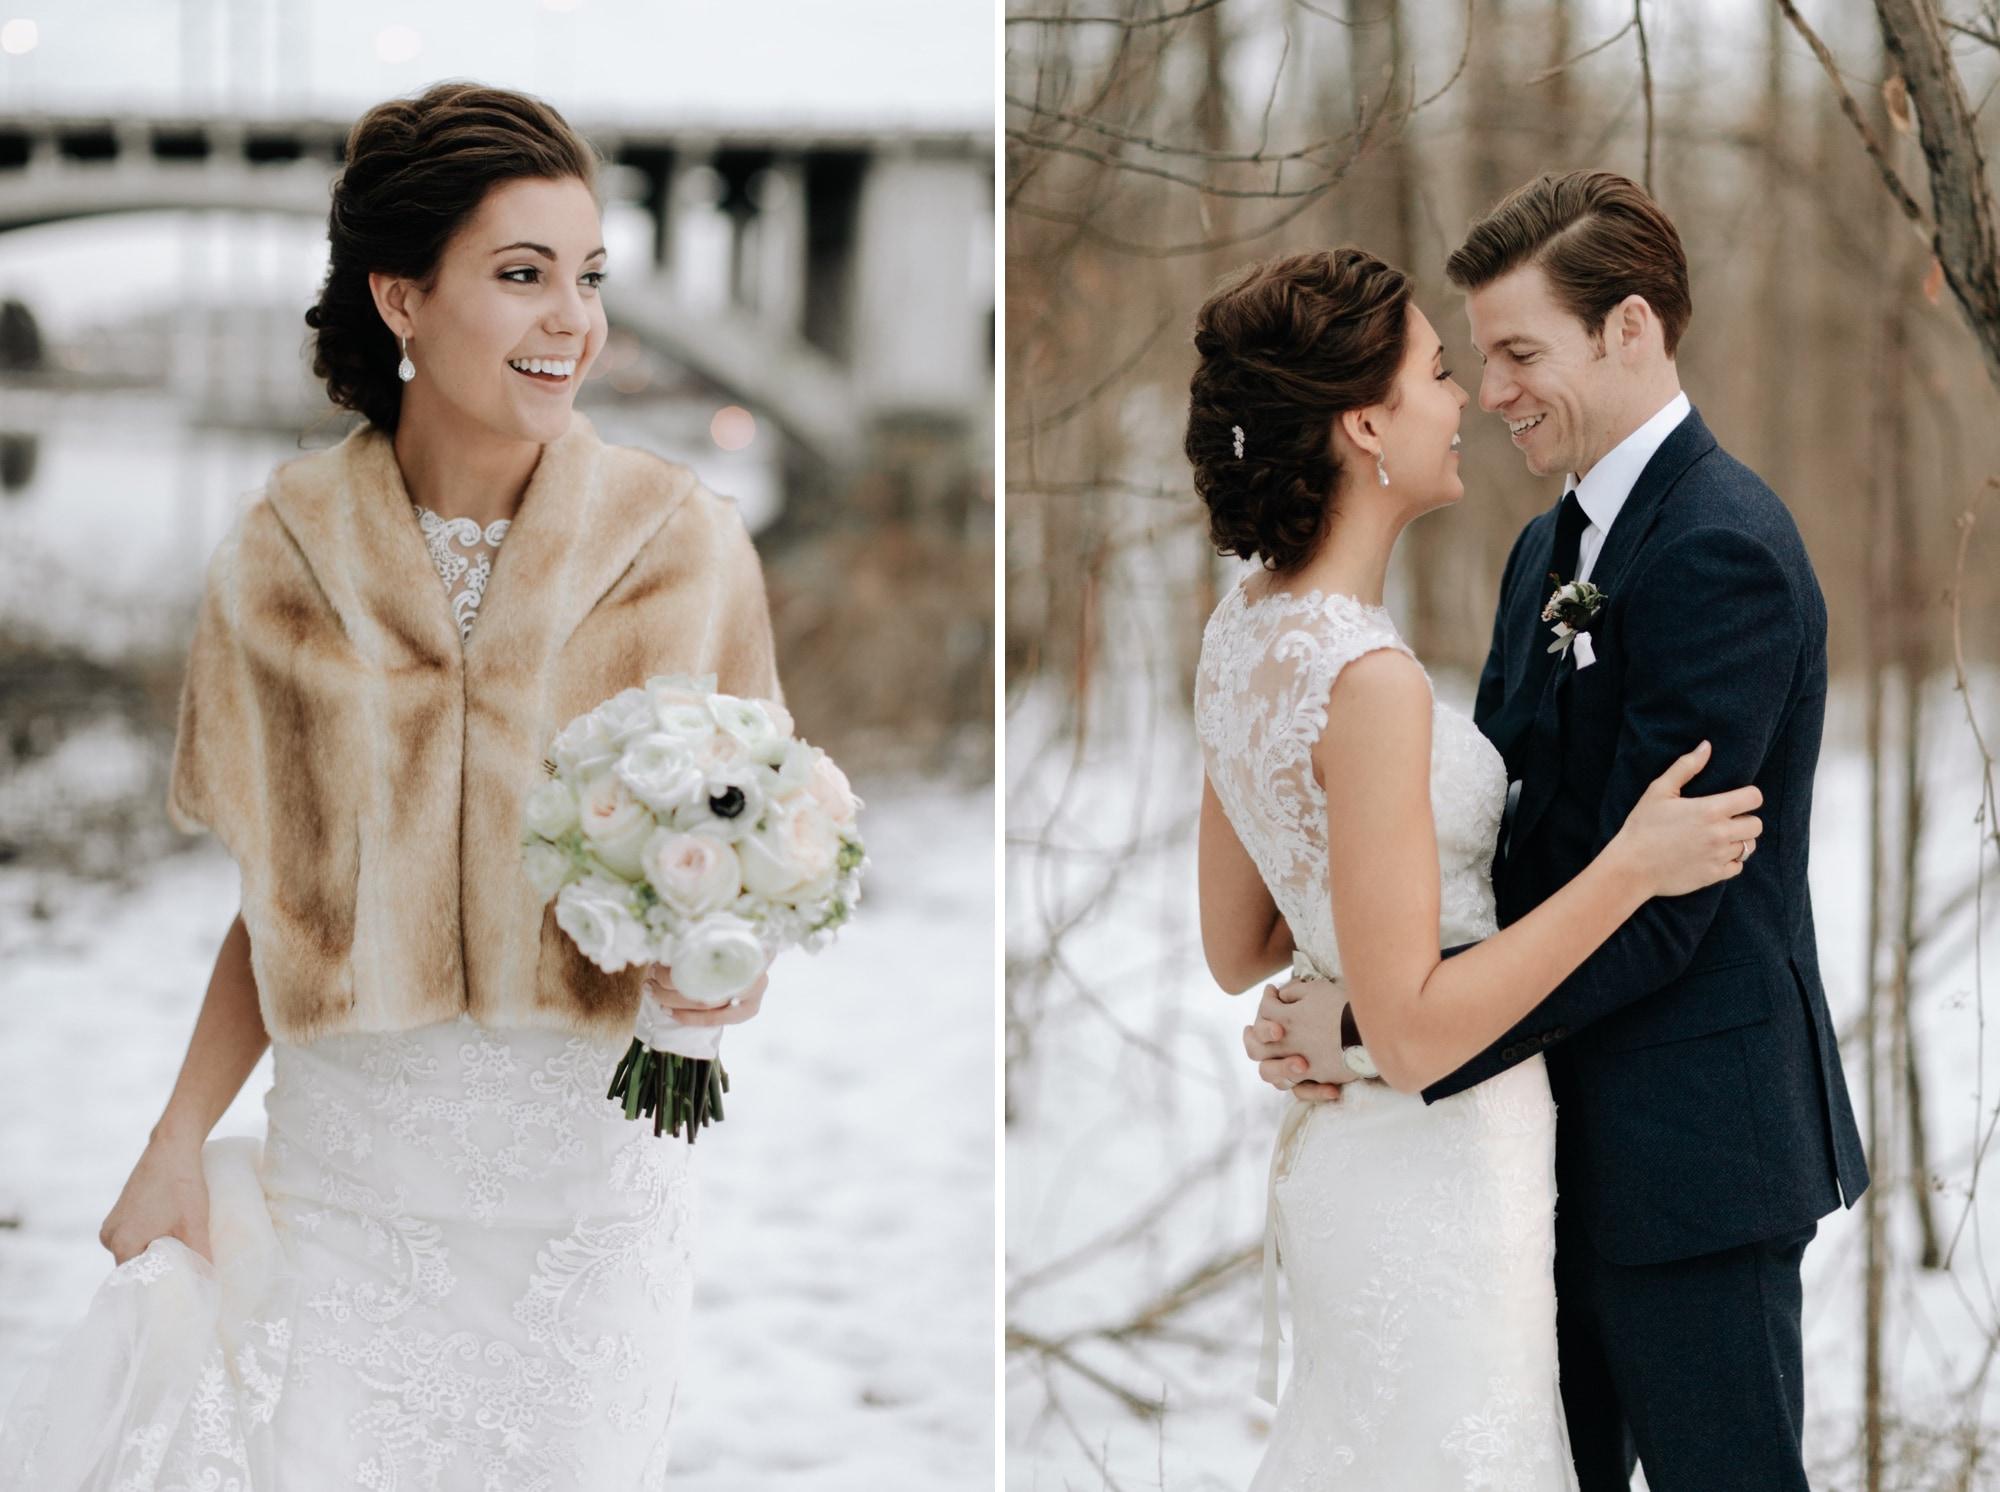 Nicollet-Island-Pavilion-Winter-Wedding-Minneapolis_41.jpg